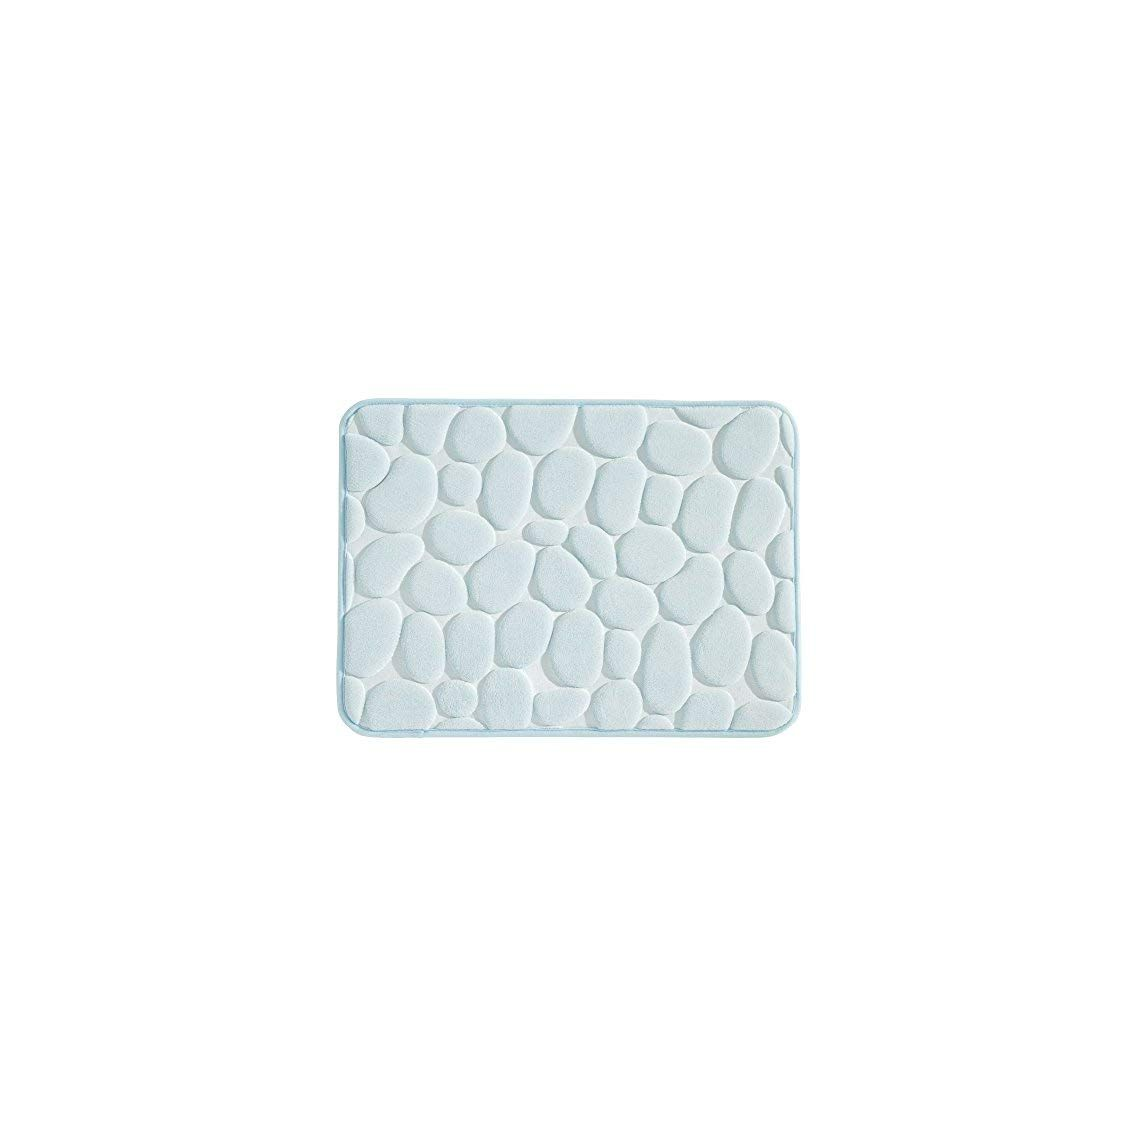 Mdesign Small Pebble Accent Rug Memory Foam Non Slip Bath Mat For